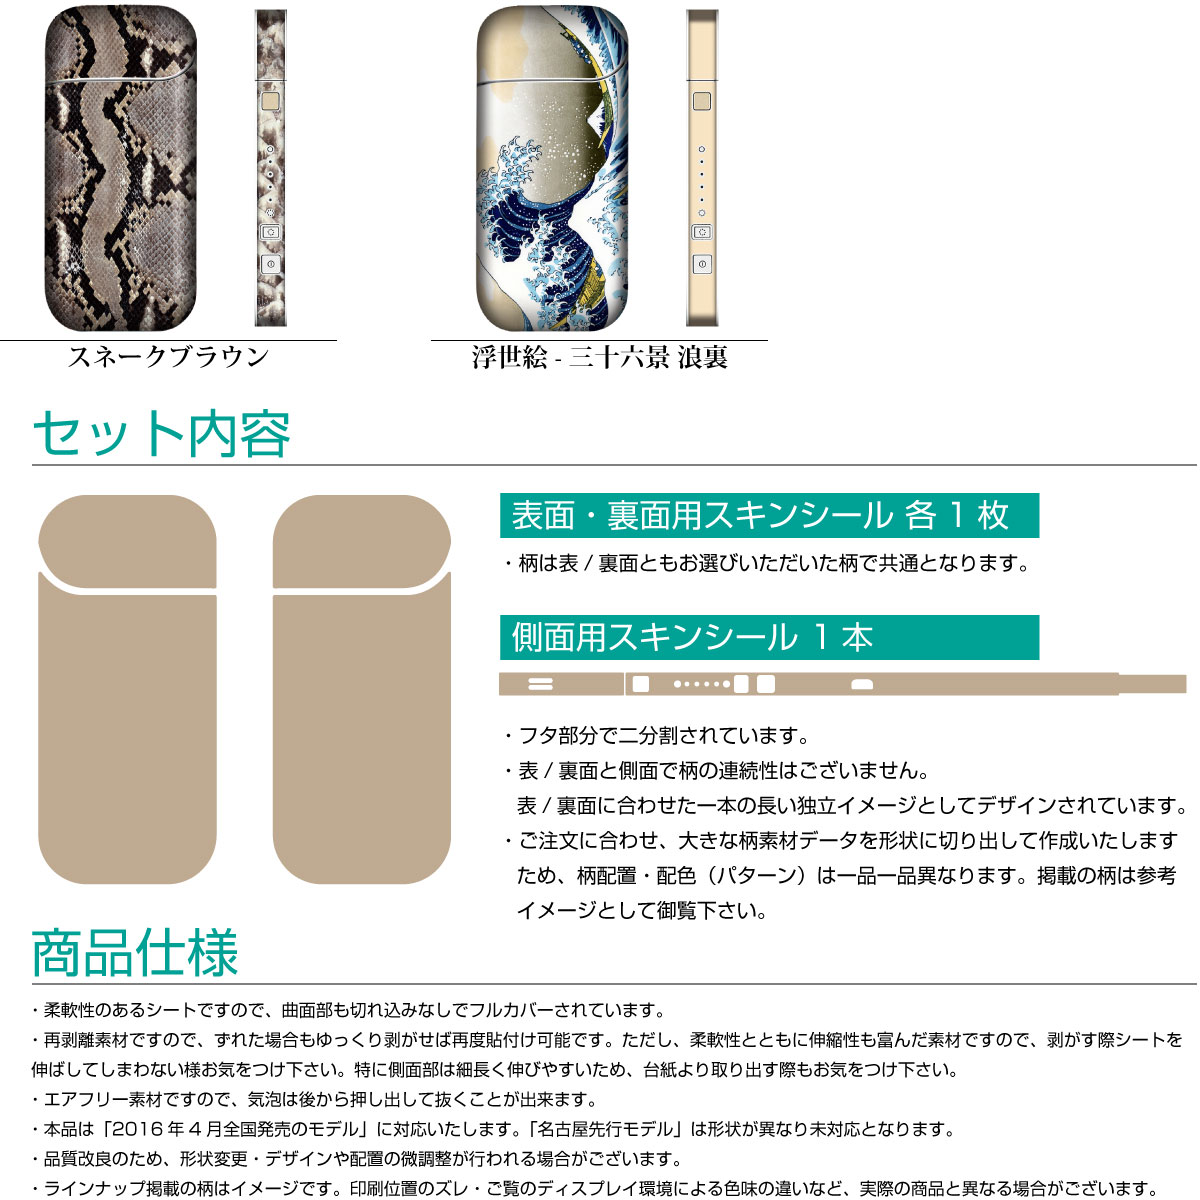 iQOS(アイコス) 専用 デコレーション スキンシール 表面・裏面&側面セット 【 人気20柄から選べる! 】